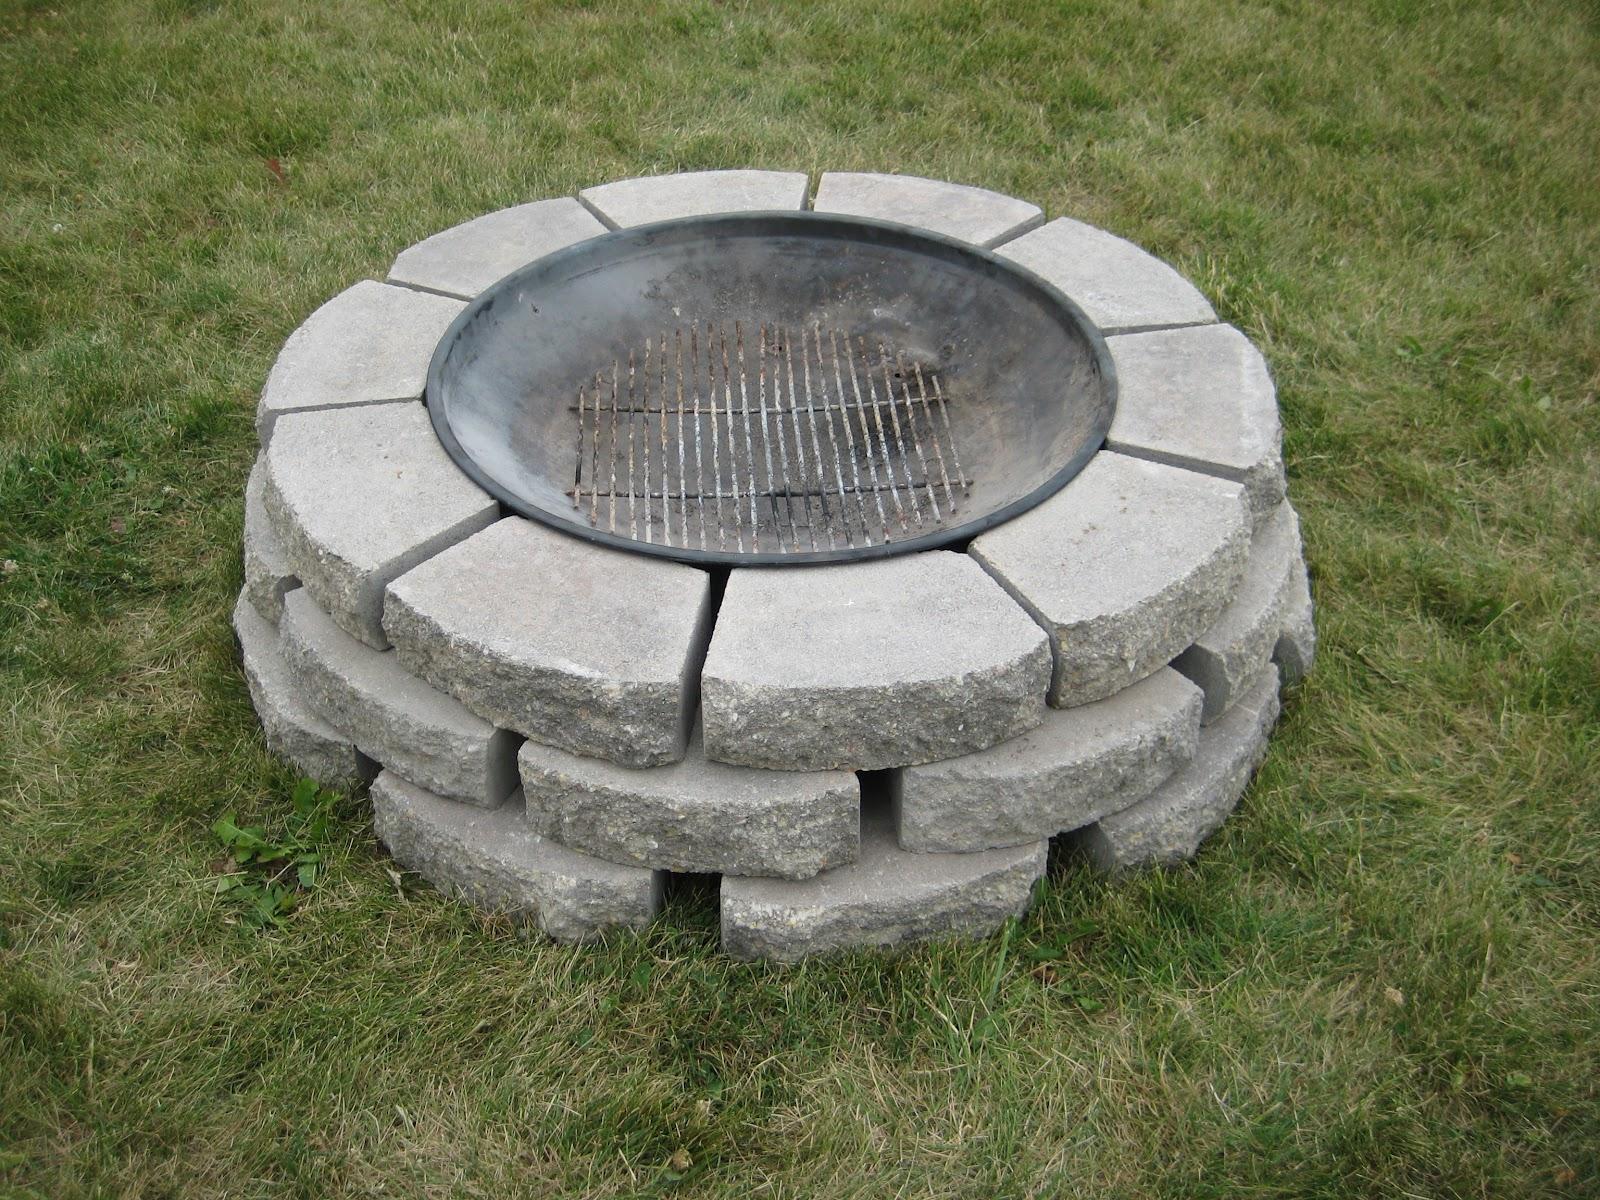 DIY Homemade Fire Pit thanks to #Pinterest - momma in flip ...